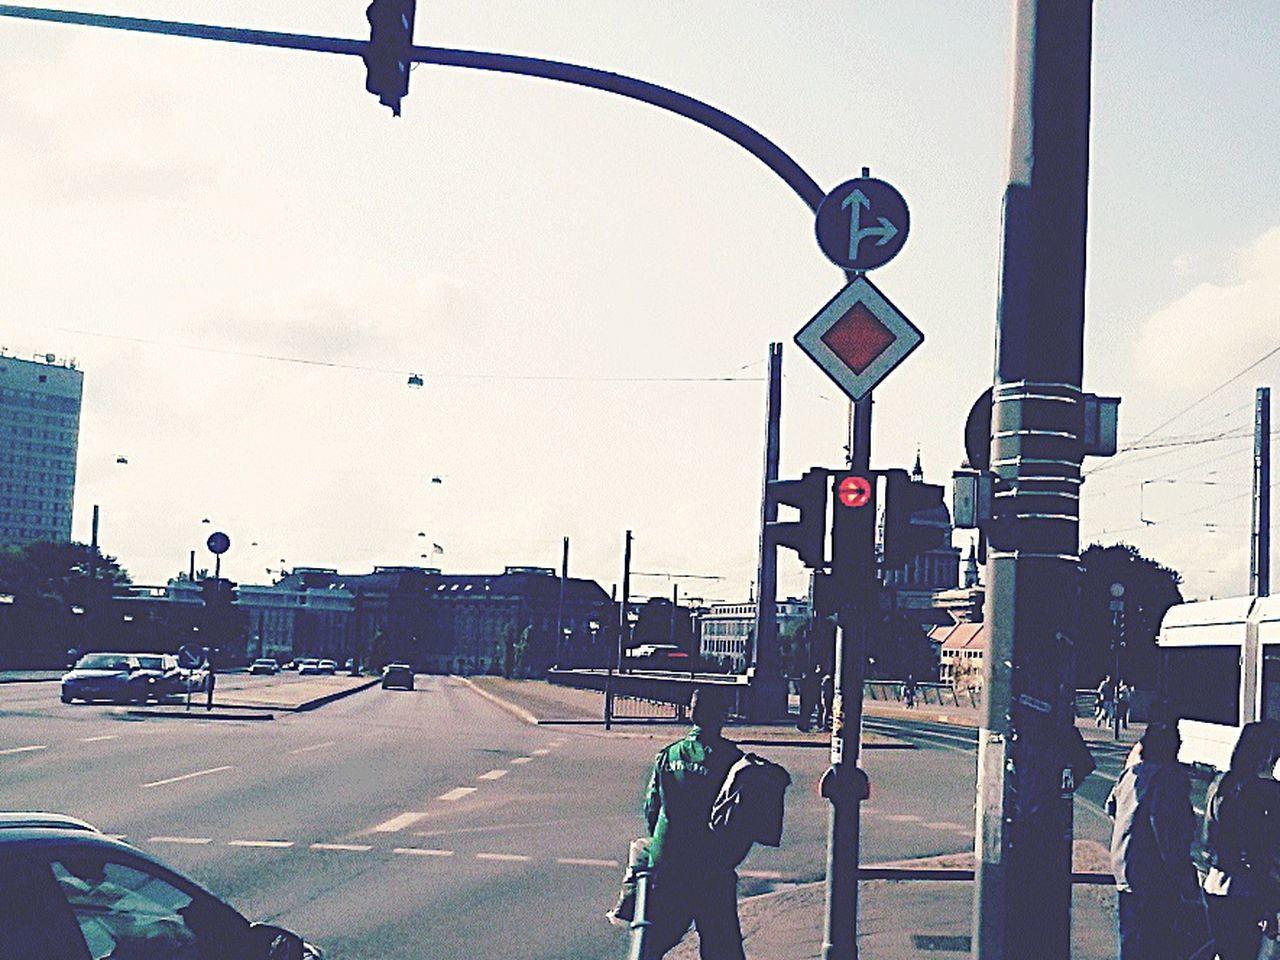 potsdam city City Life Potsdam Lifestyle Photography Blogging Anniesbeautyhouse